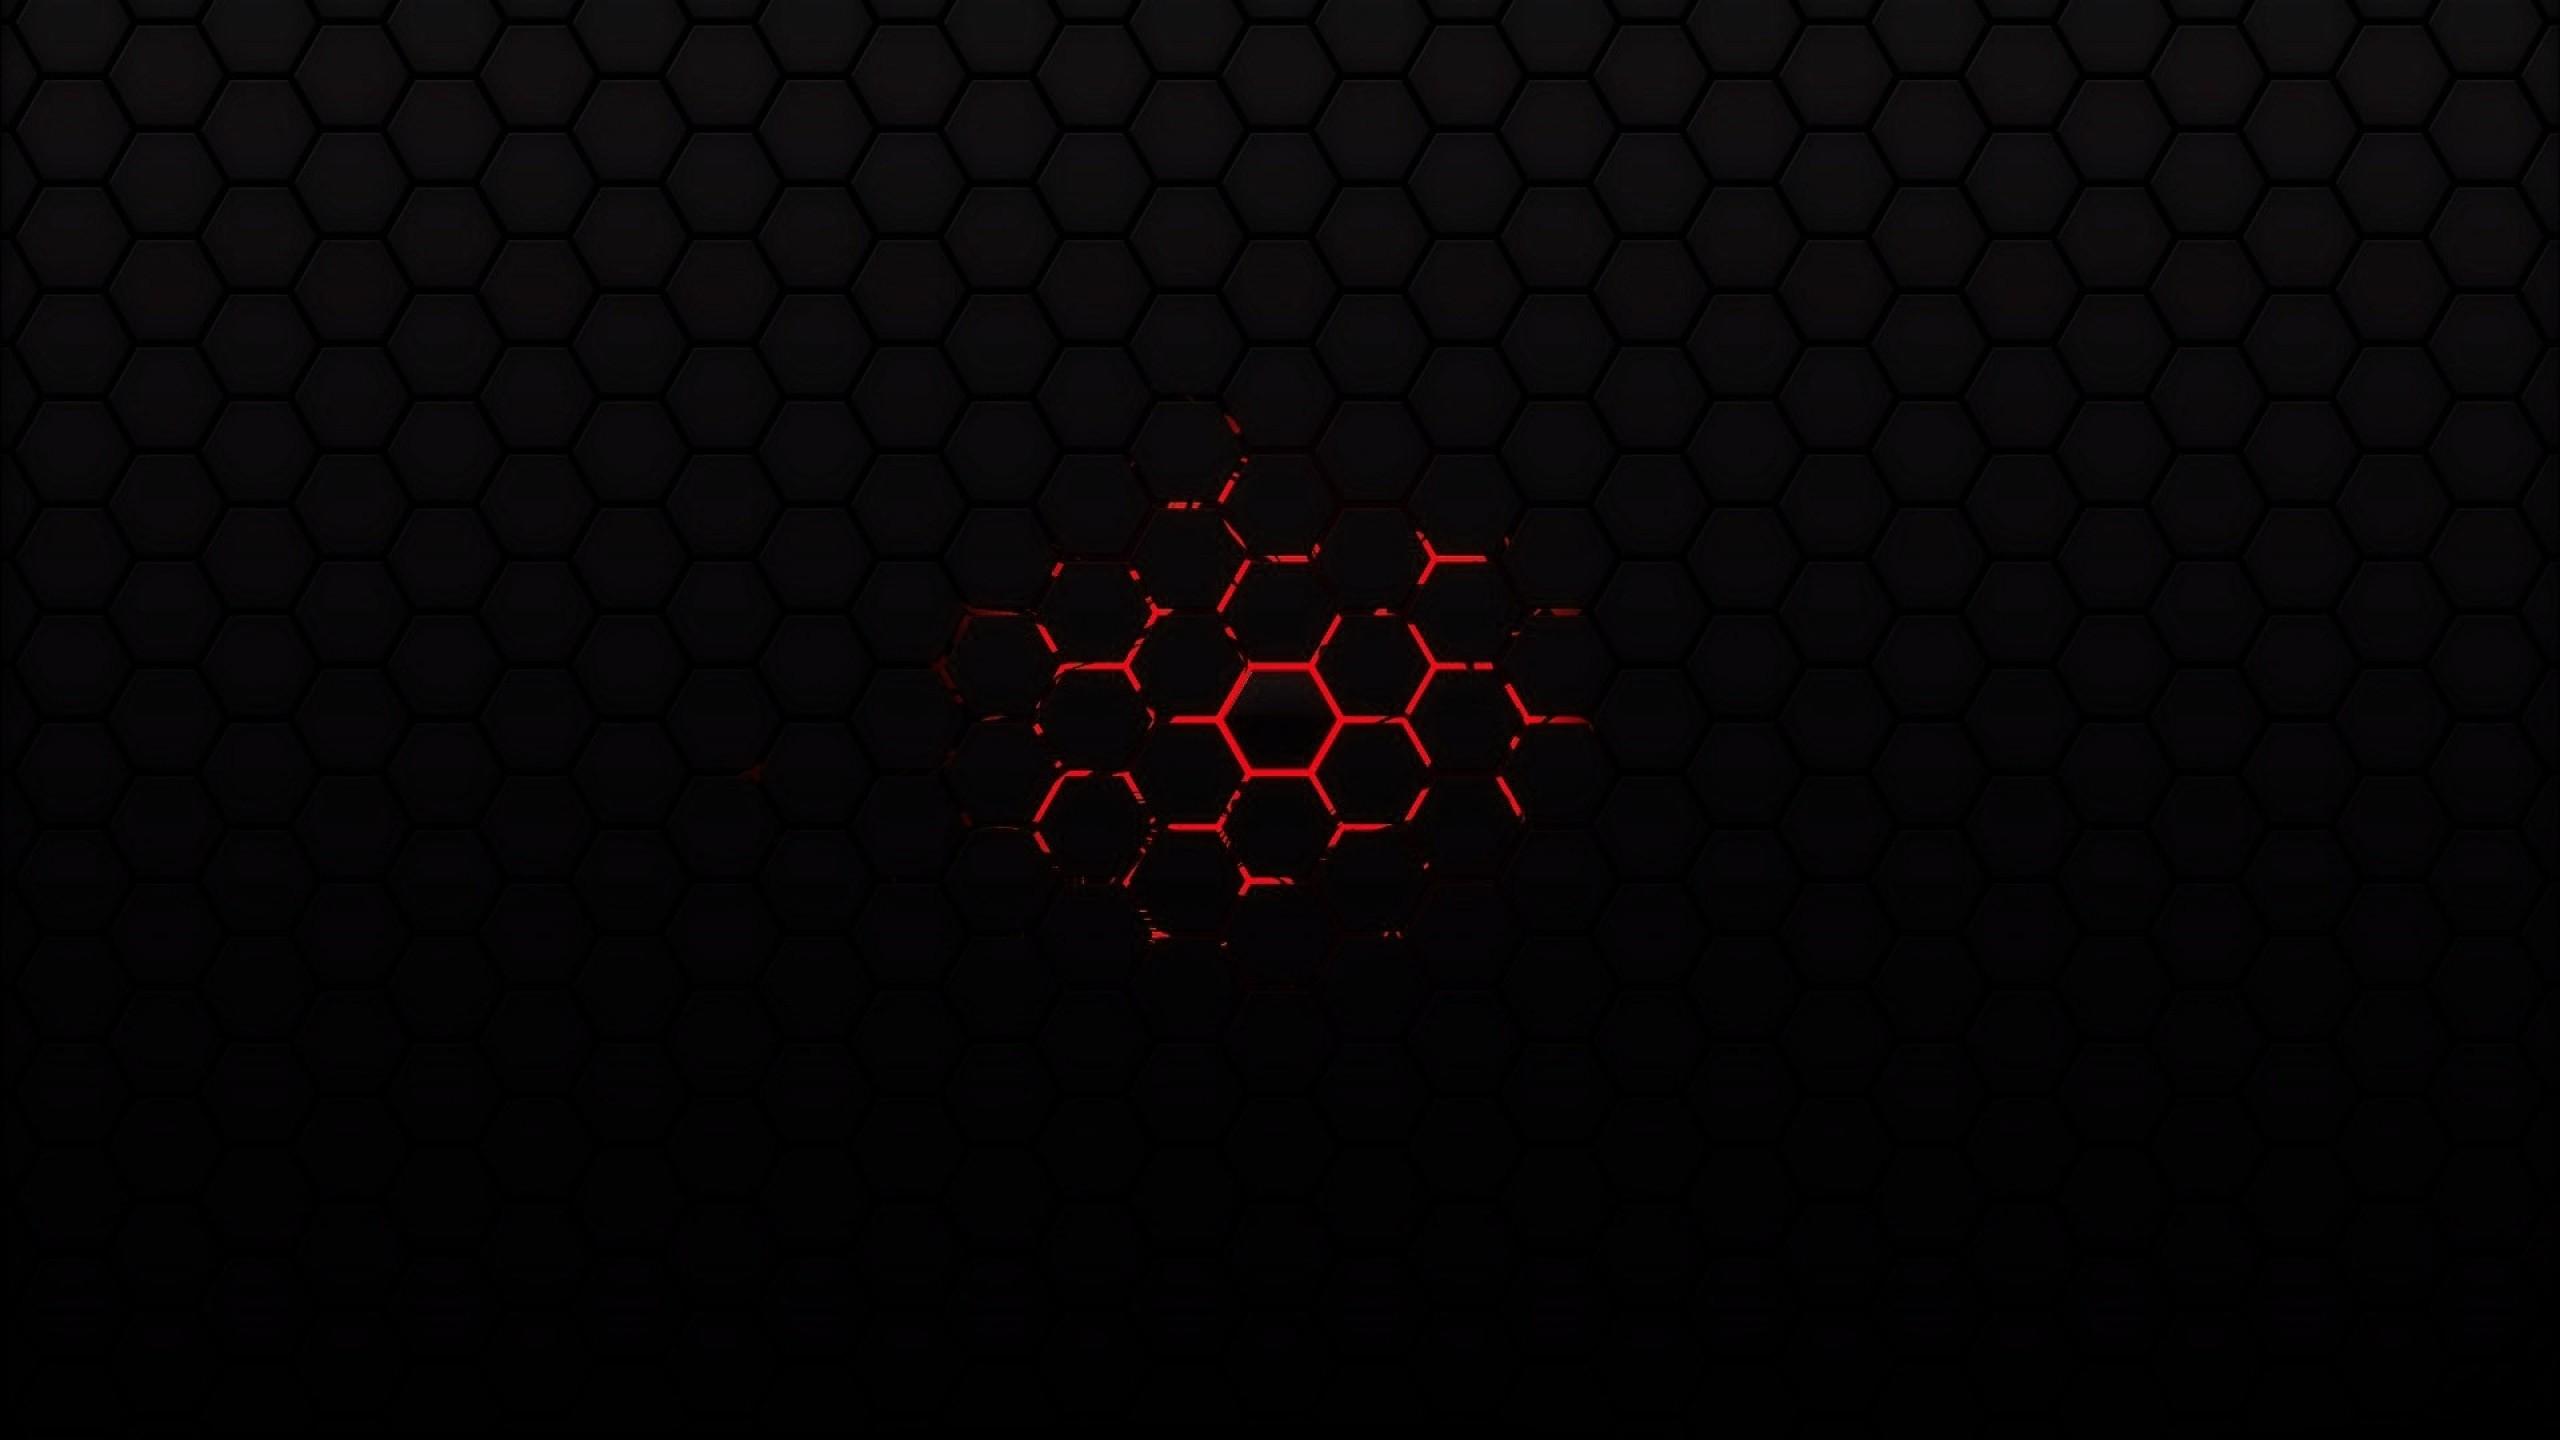 black red black background Wallpaper HD